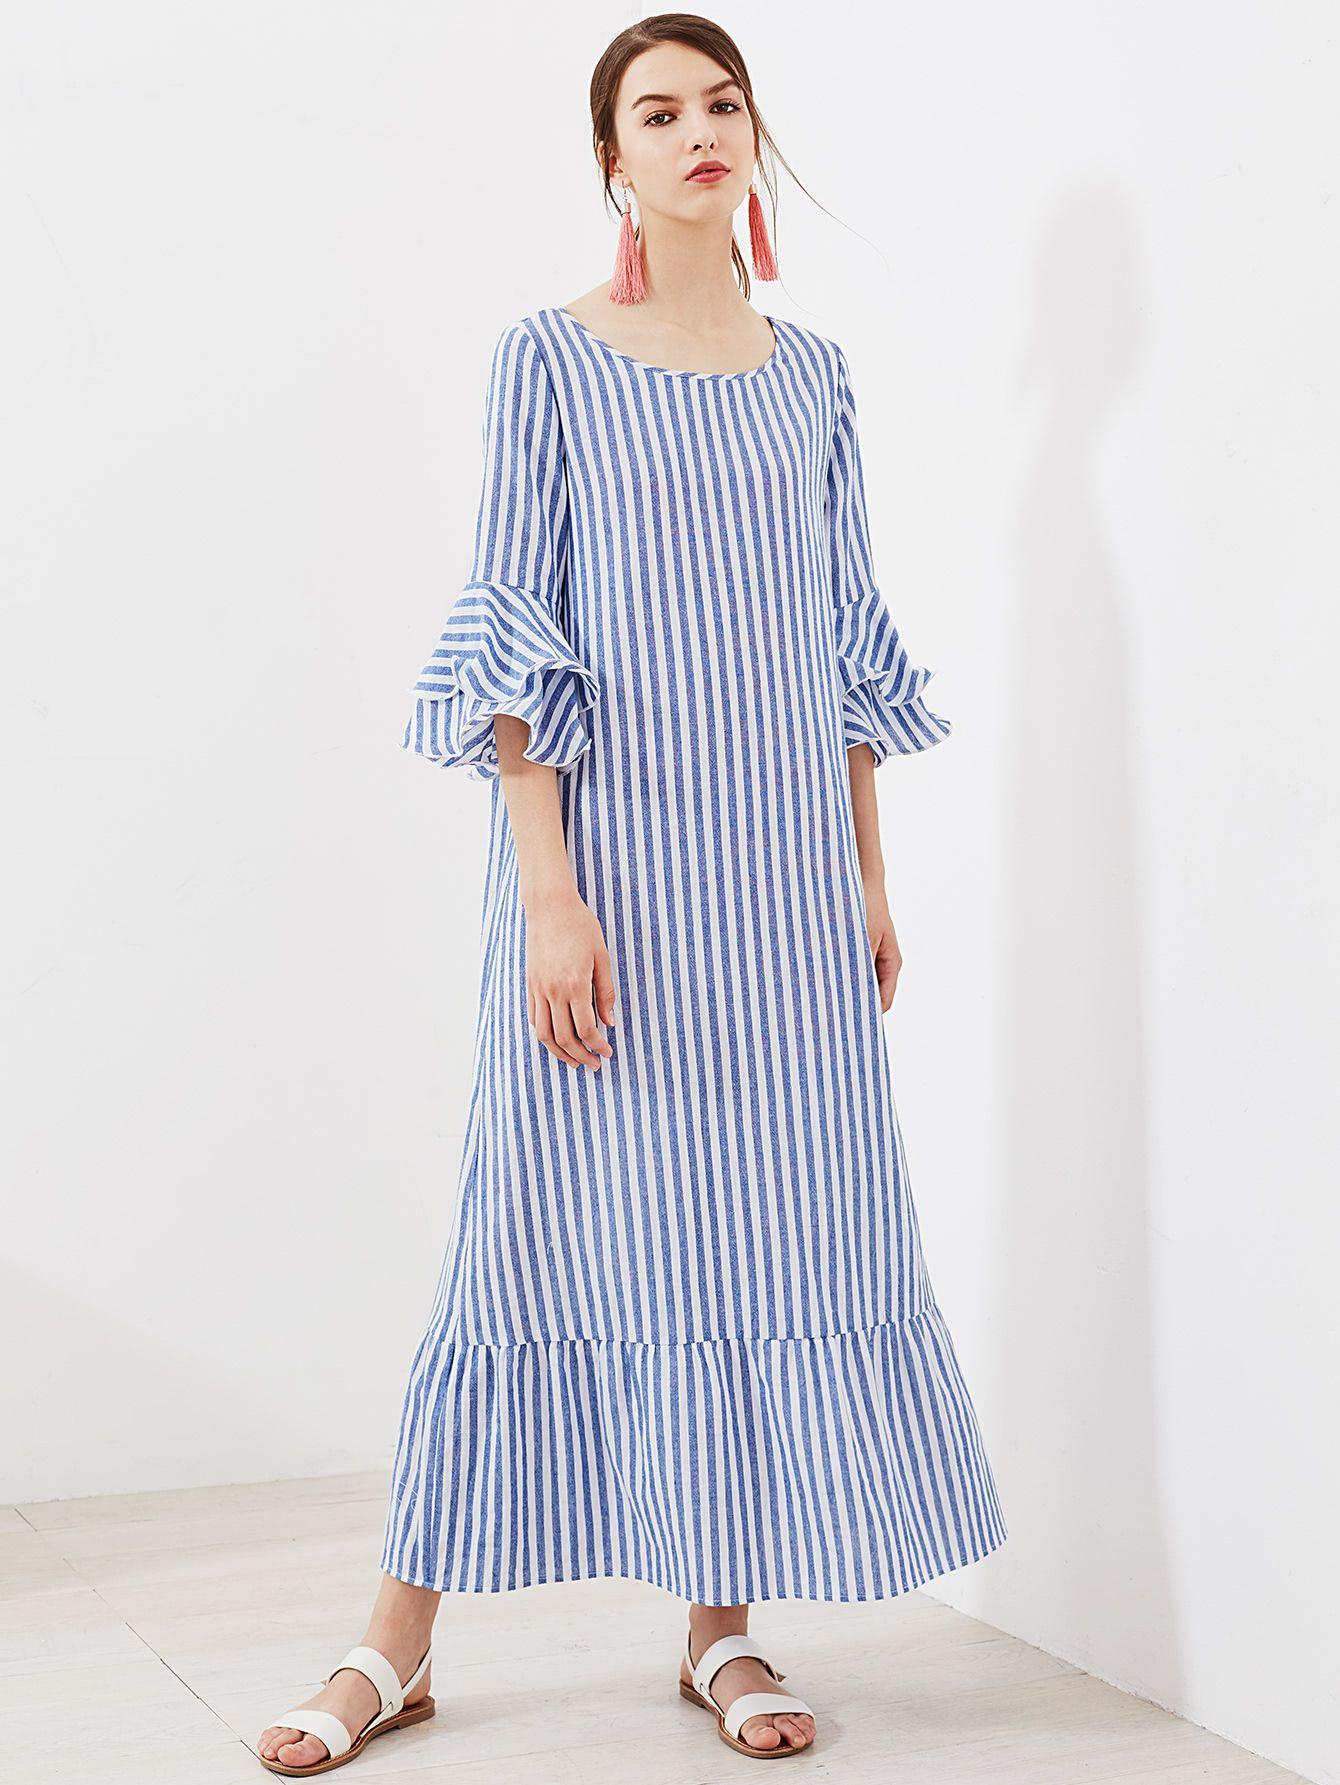 Layered Bell Sleeve Striped Kaftan Dress Sewing Dresses Trendy Dresses Summer Dresses [ 1785 x 1340 Pixel ]